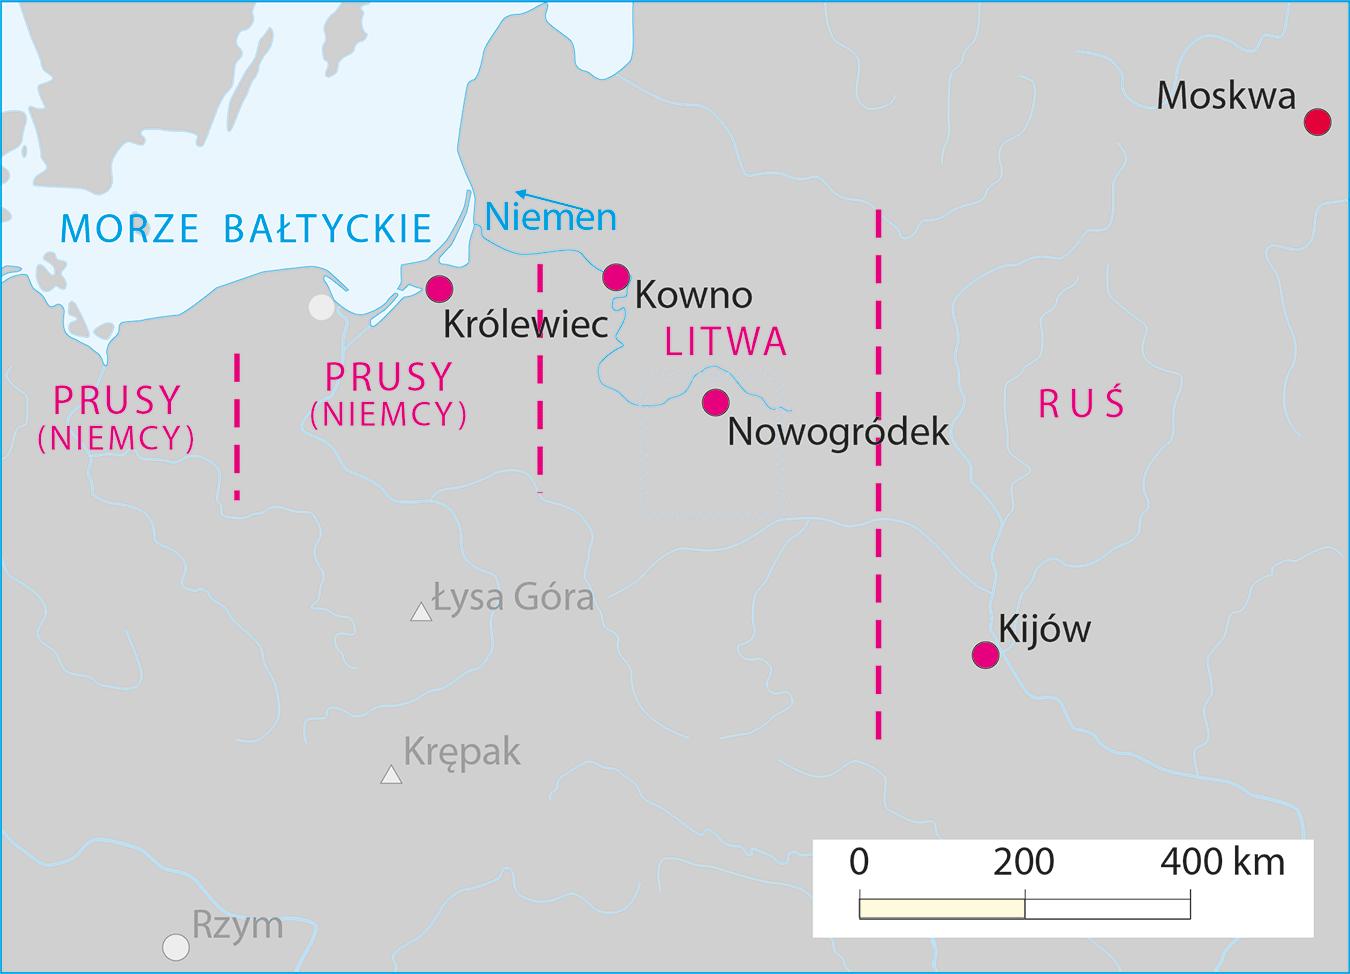 Nowa Panorama Literatury Polskiej Ballady I Romanse Mapy